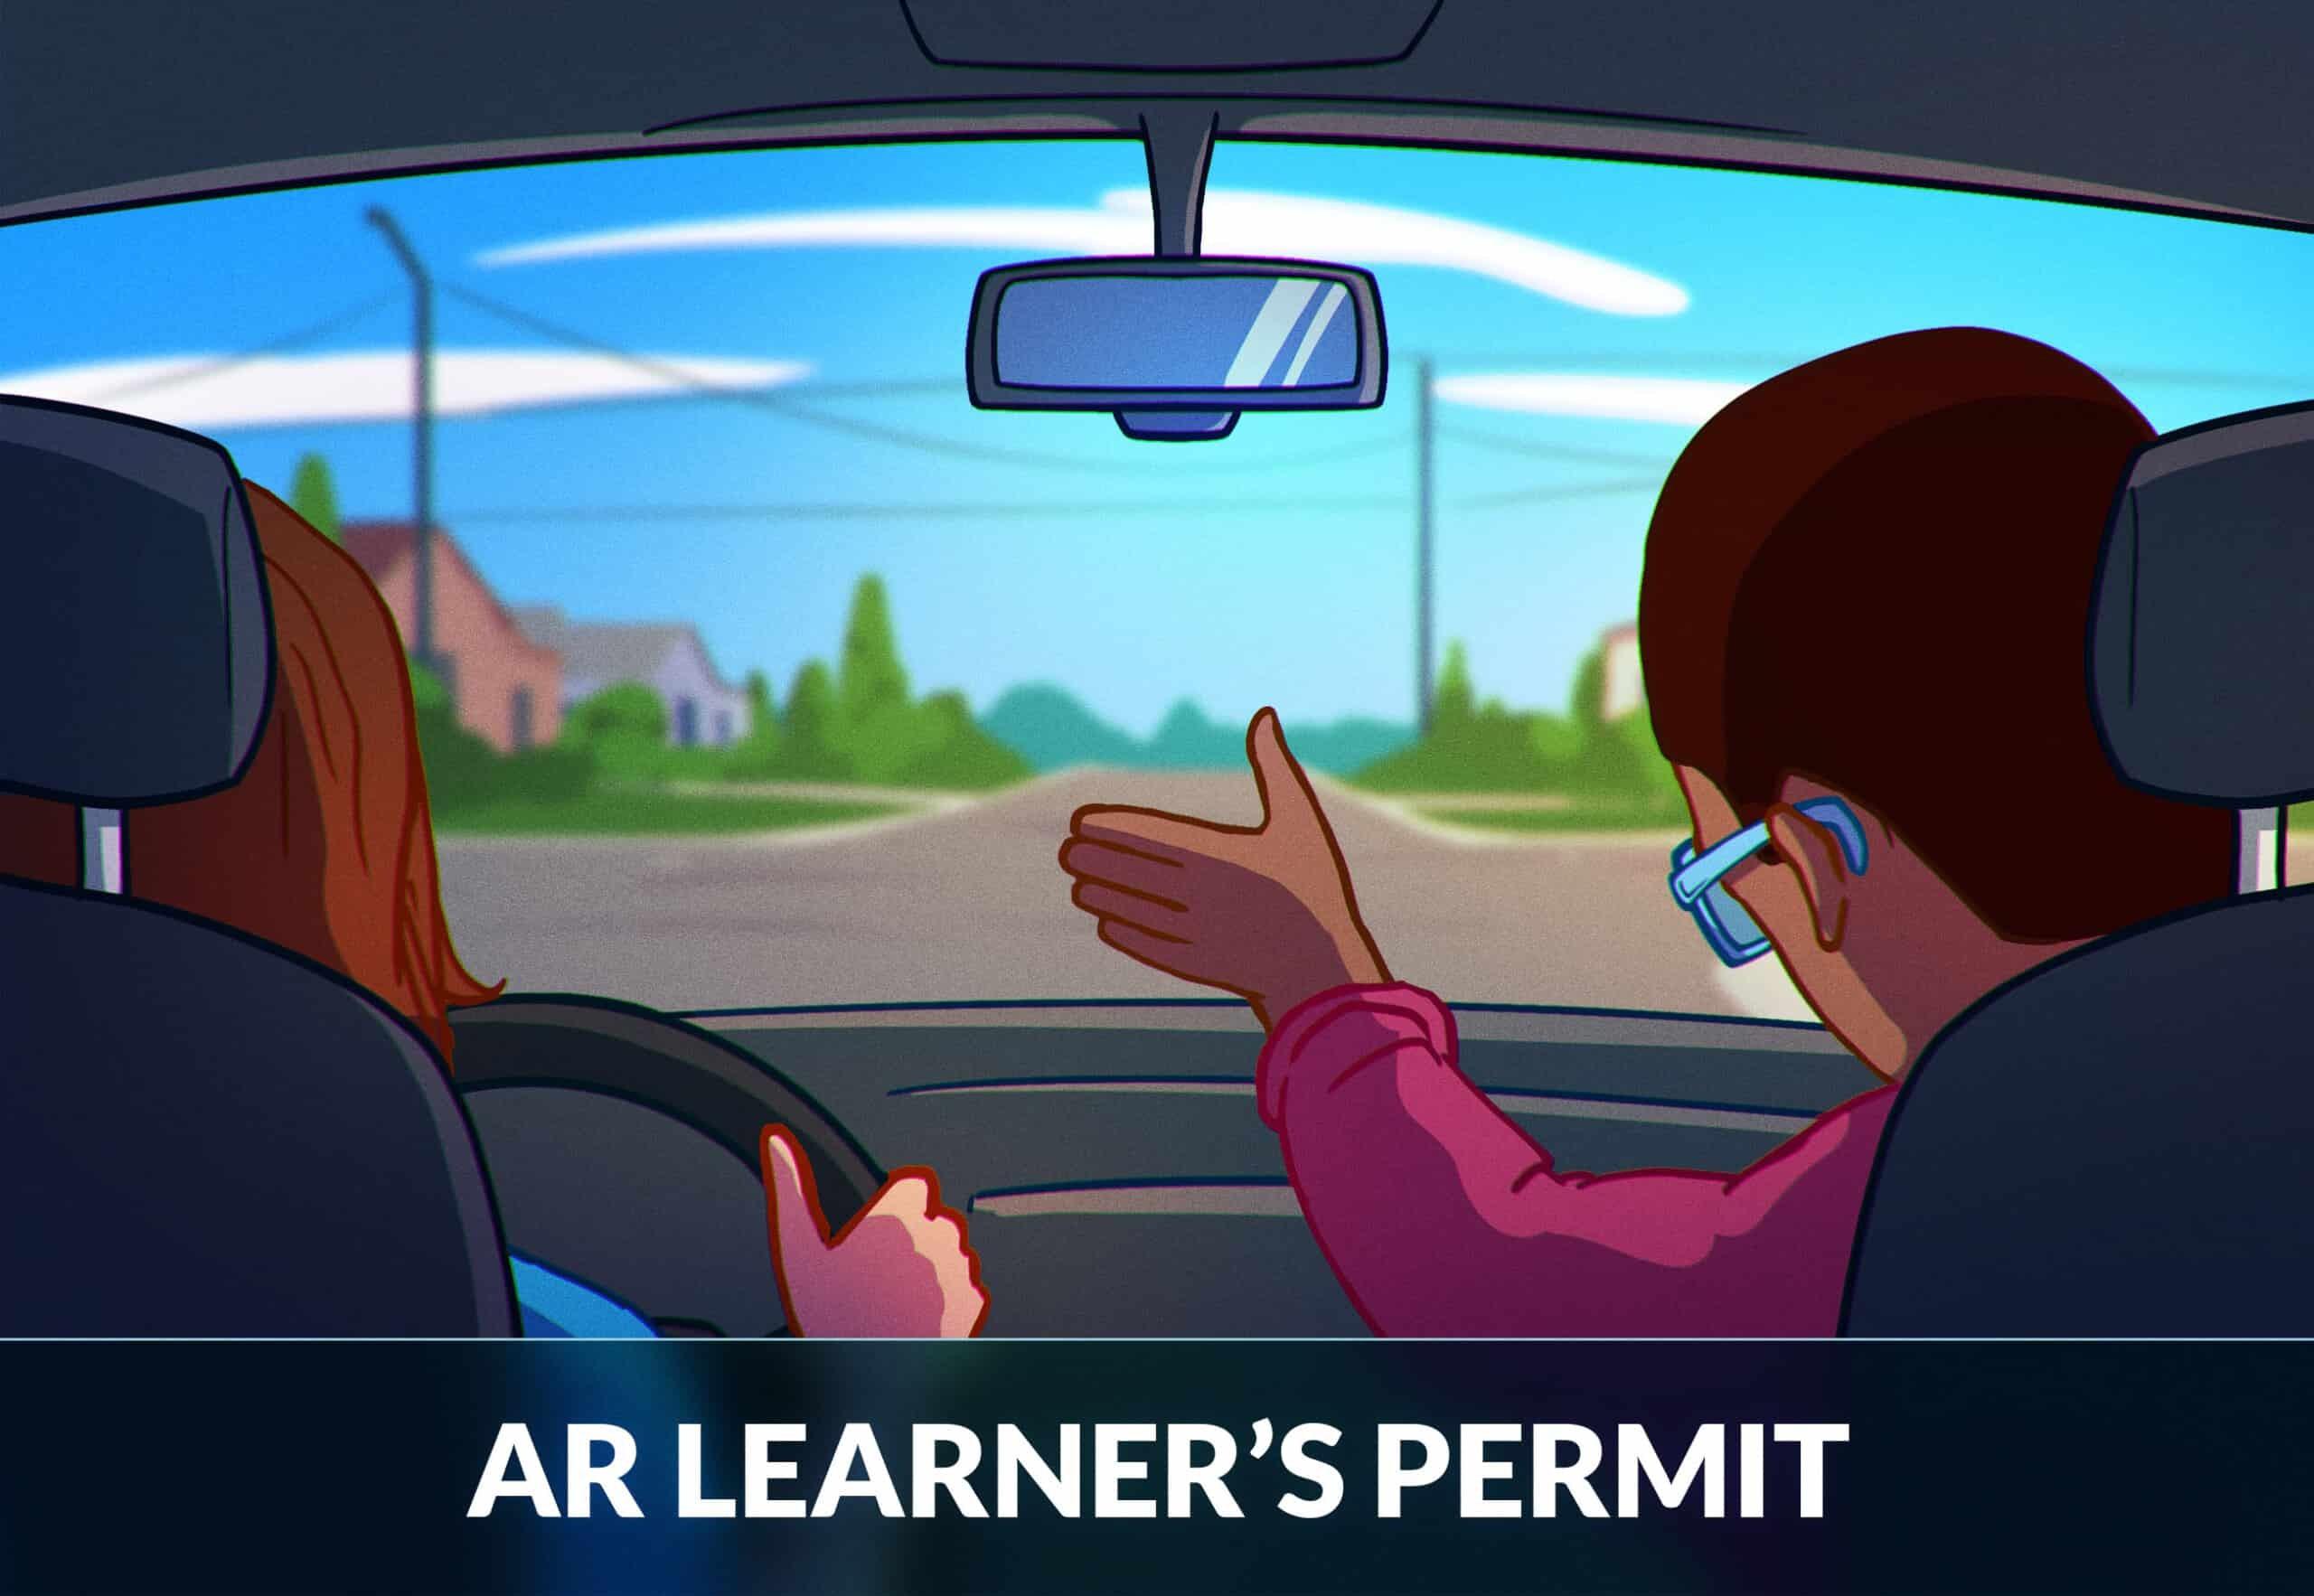 Arkansas Learner's Permit